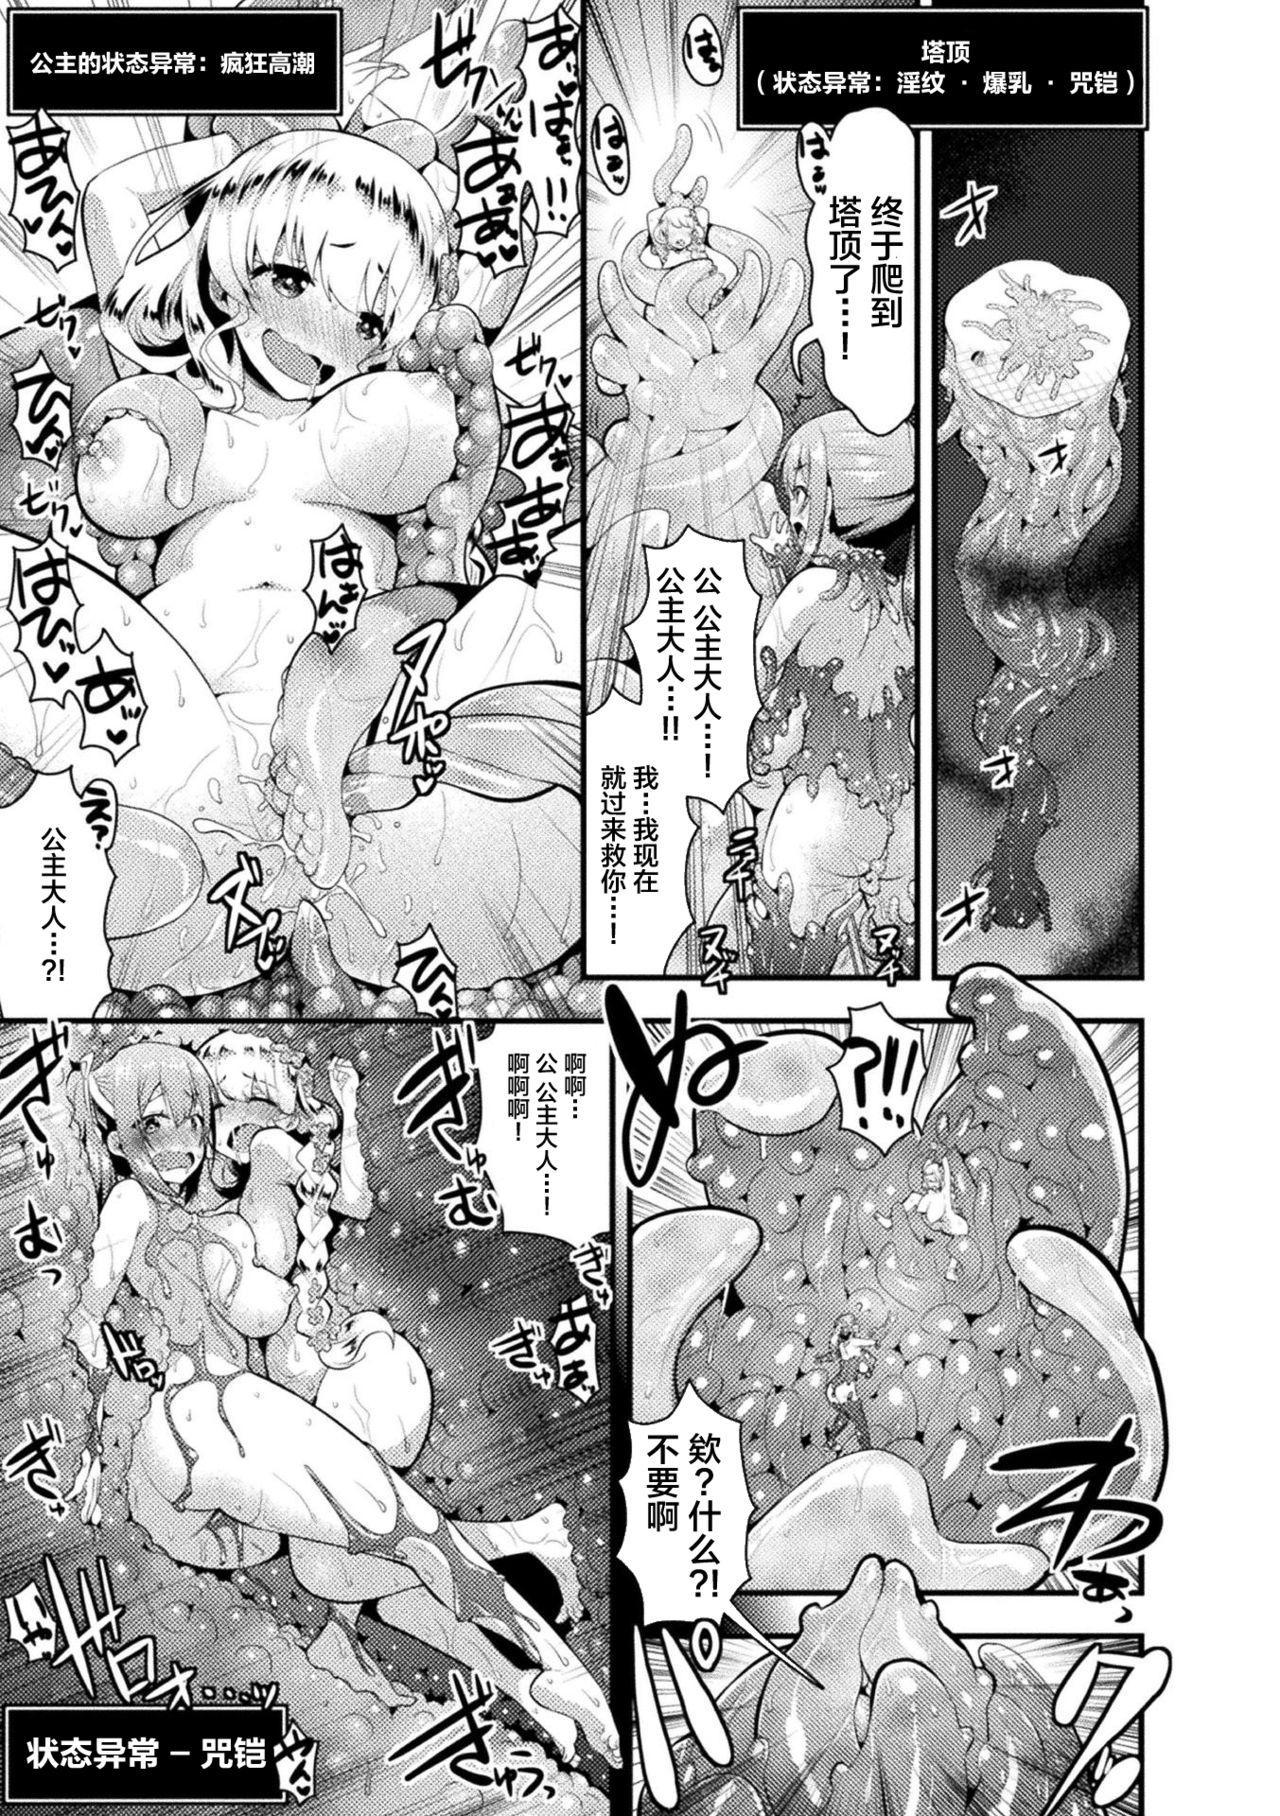 2D Comic Magazine Zecchou Kairaku ga Tomaranai Ero-Trap Dungeon Vol. 1 58